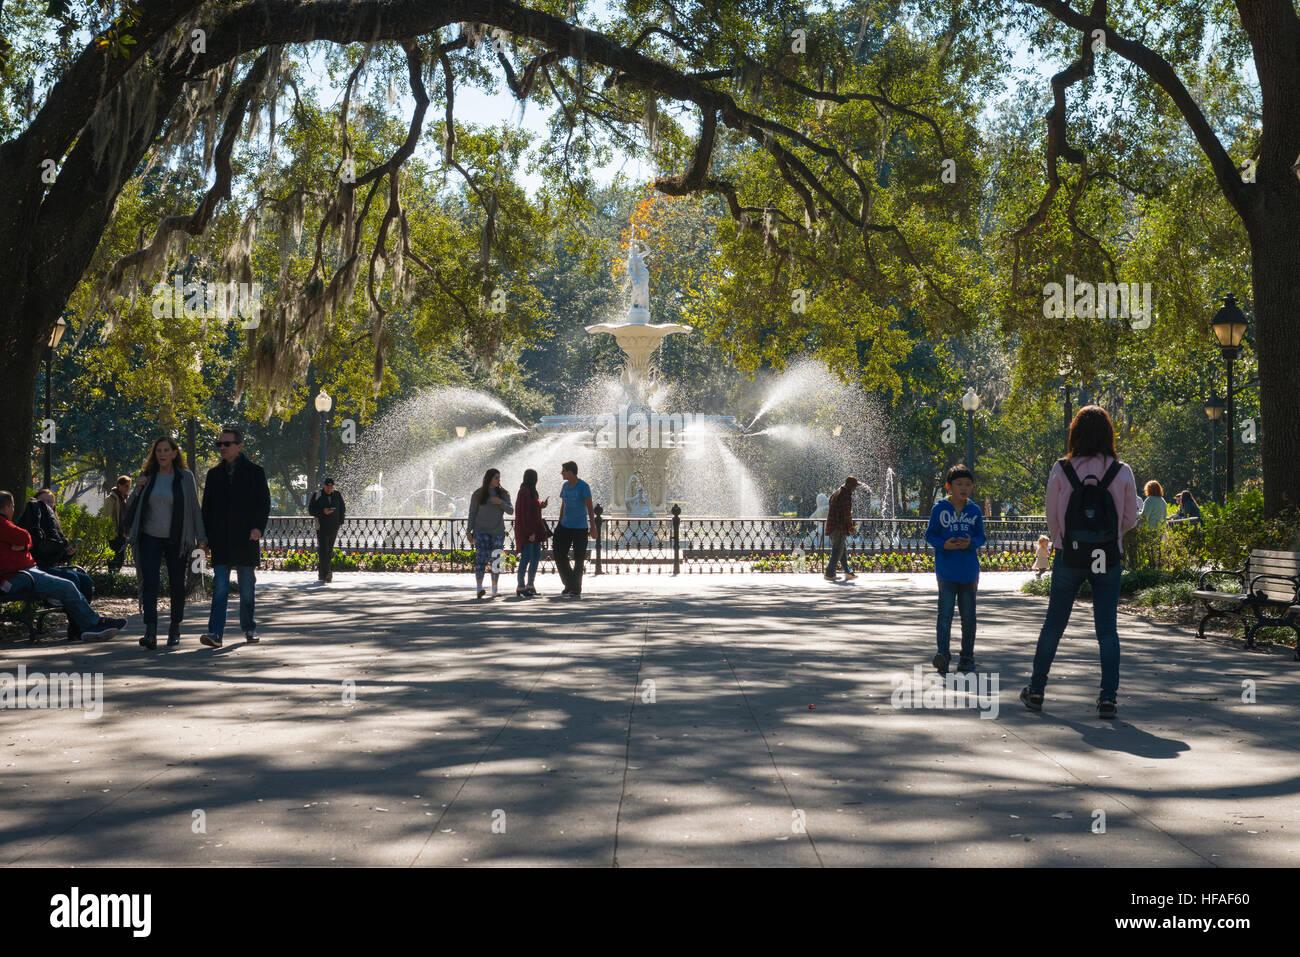 USA Georgia Savannah Forsyth Park fountain pond trees tourists sunlight - Stock Image